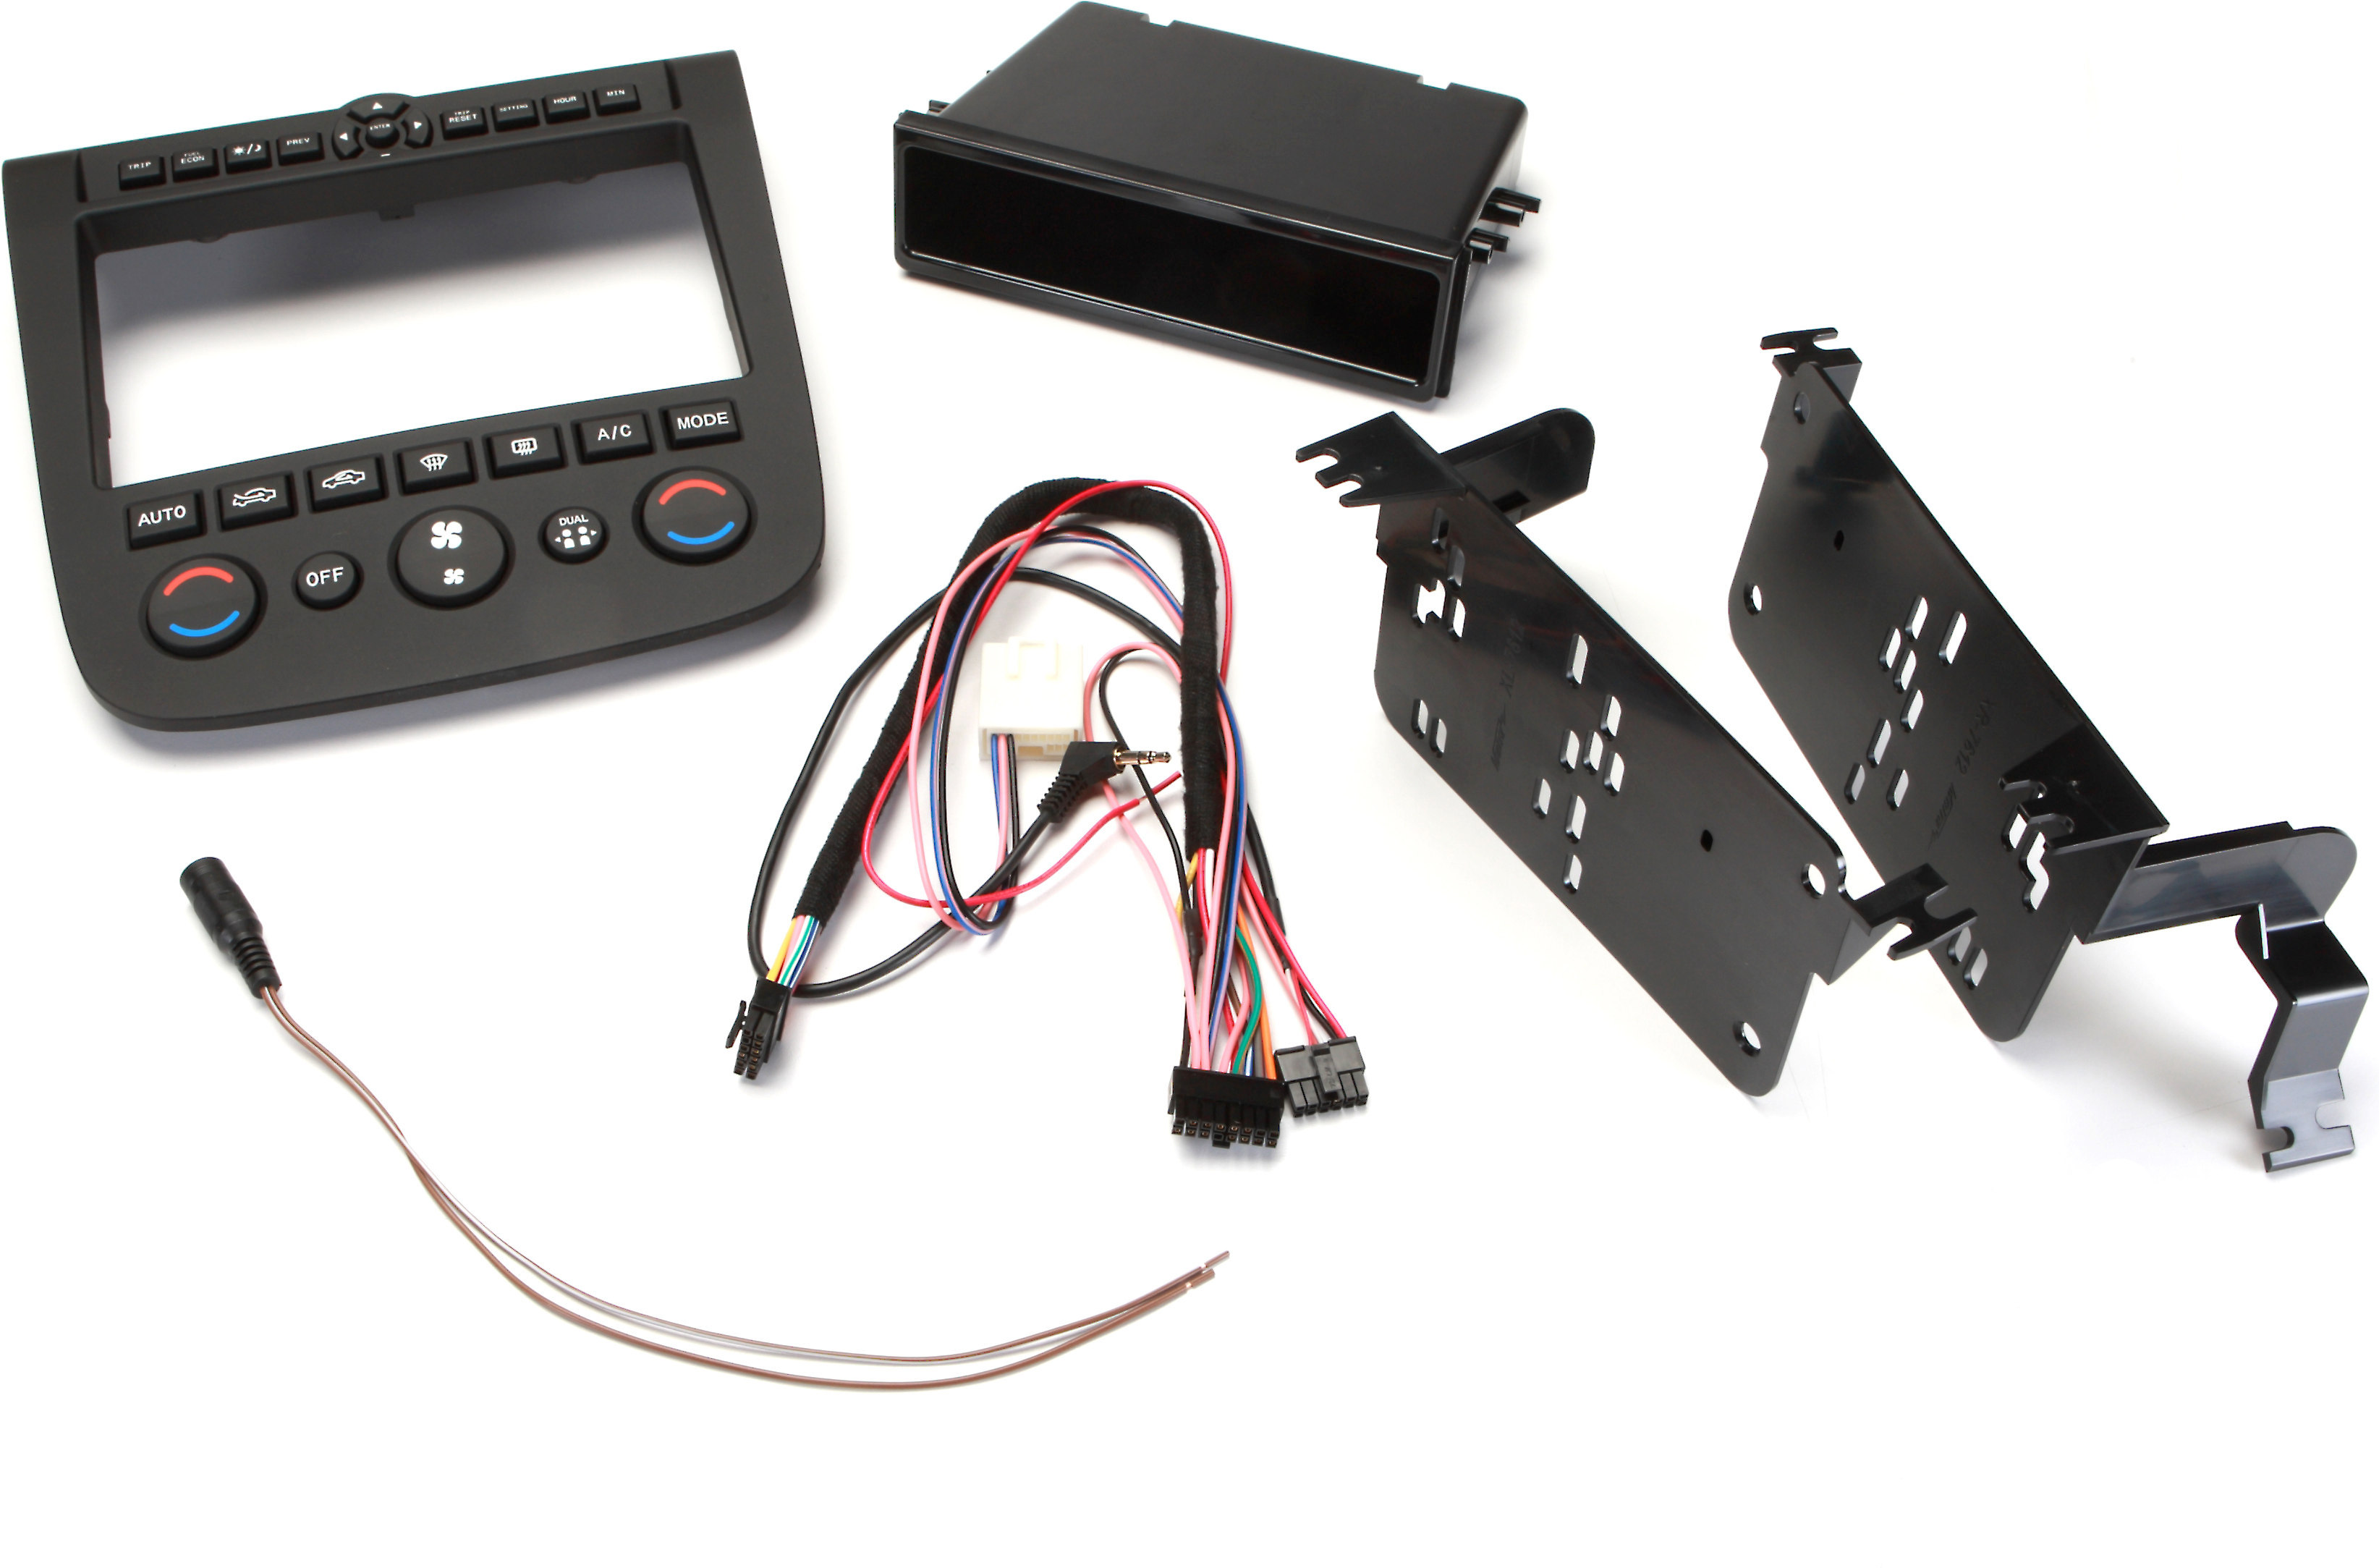 Black METRA 99-7612B Single or Double DIN Installation Dash Kit for 2003-2007 Nissan Murano